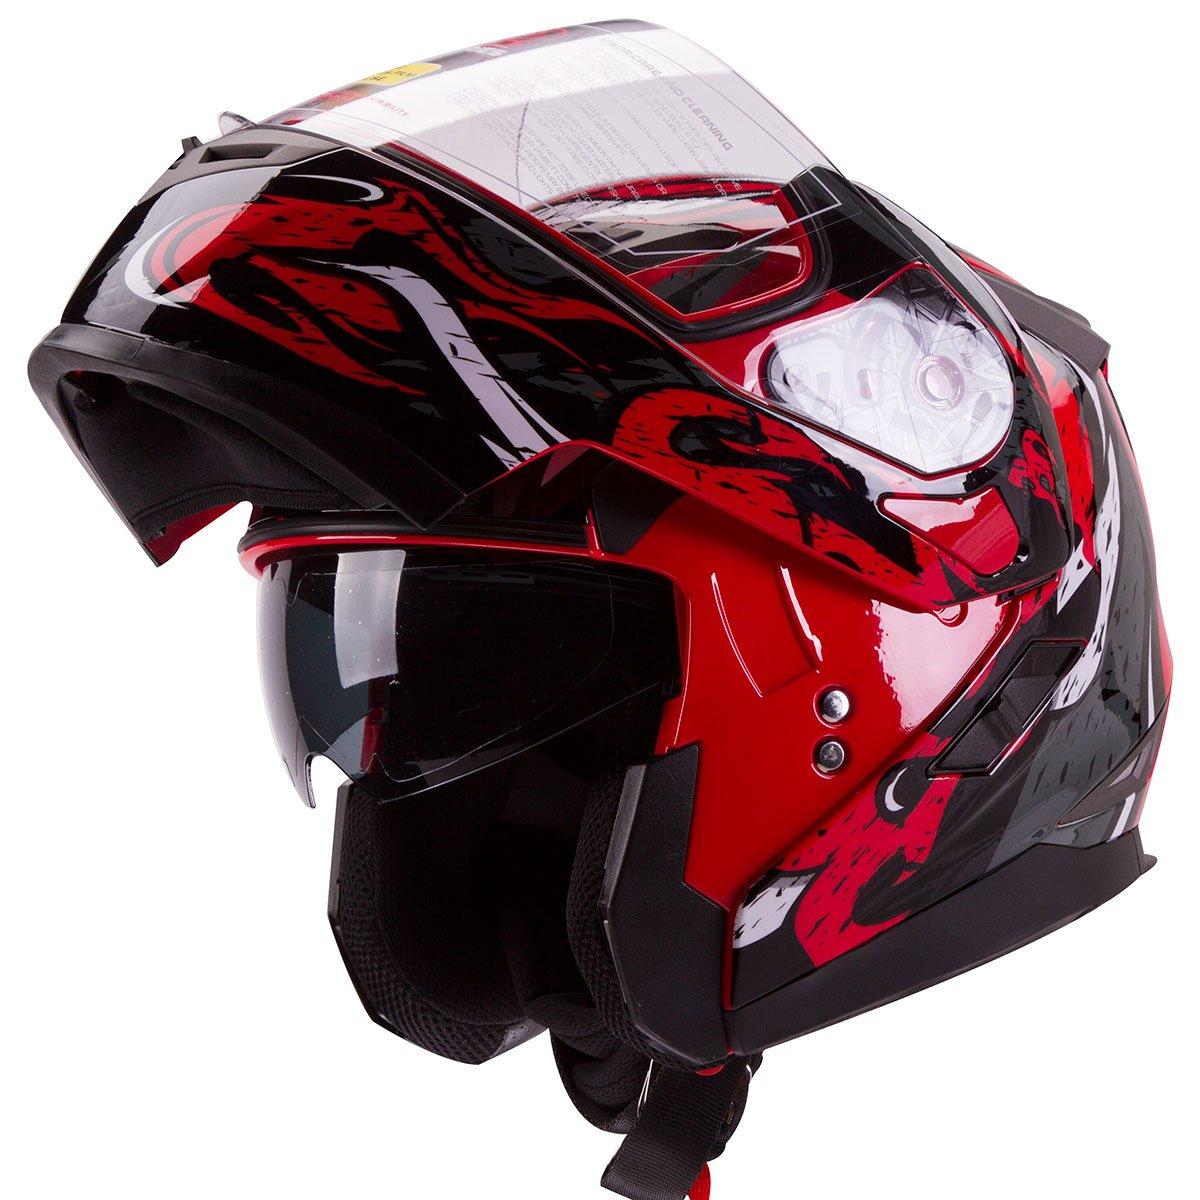 VIPER-Modular-Dual-Visor-Motorcycle